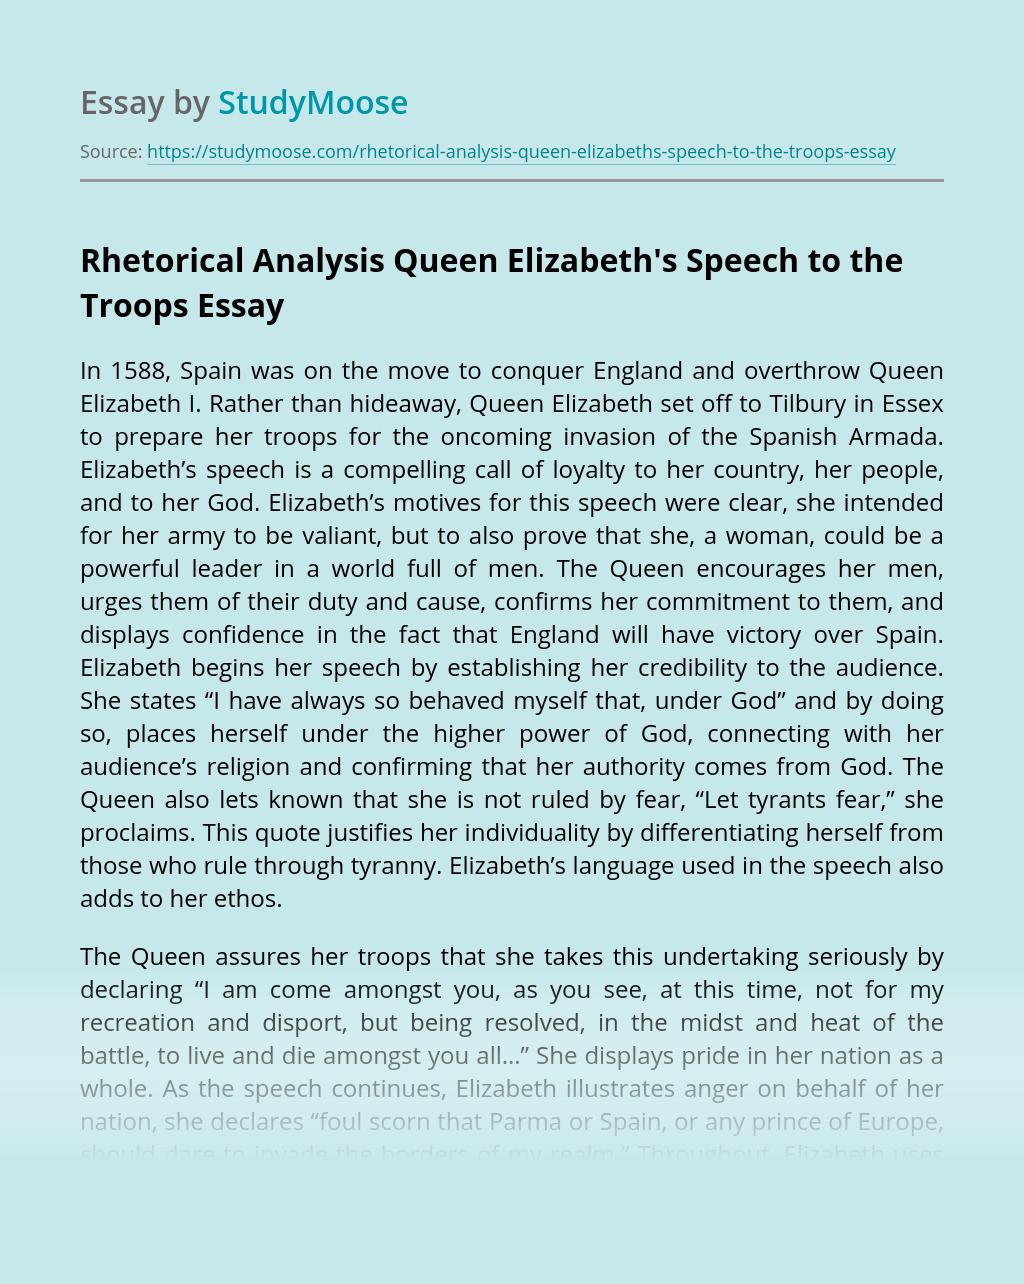 Rhetorical Analysis Queen Elizabeth's Speech to the Troops